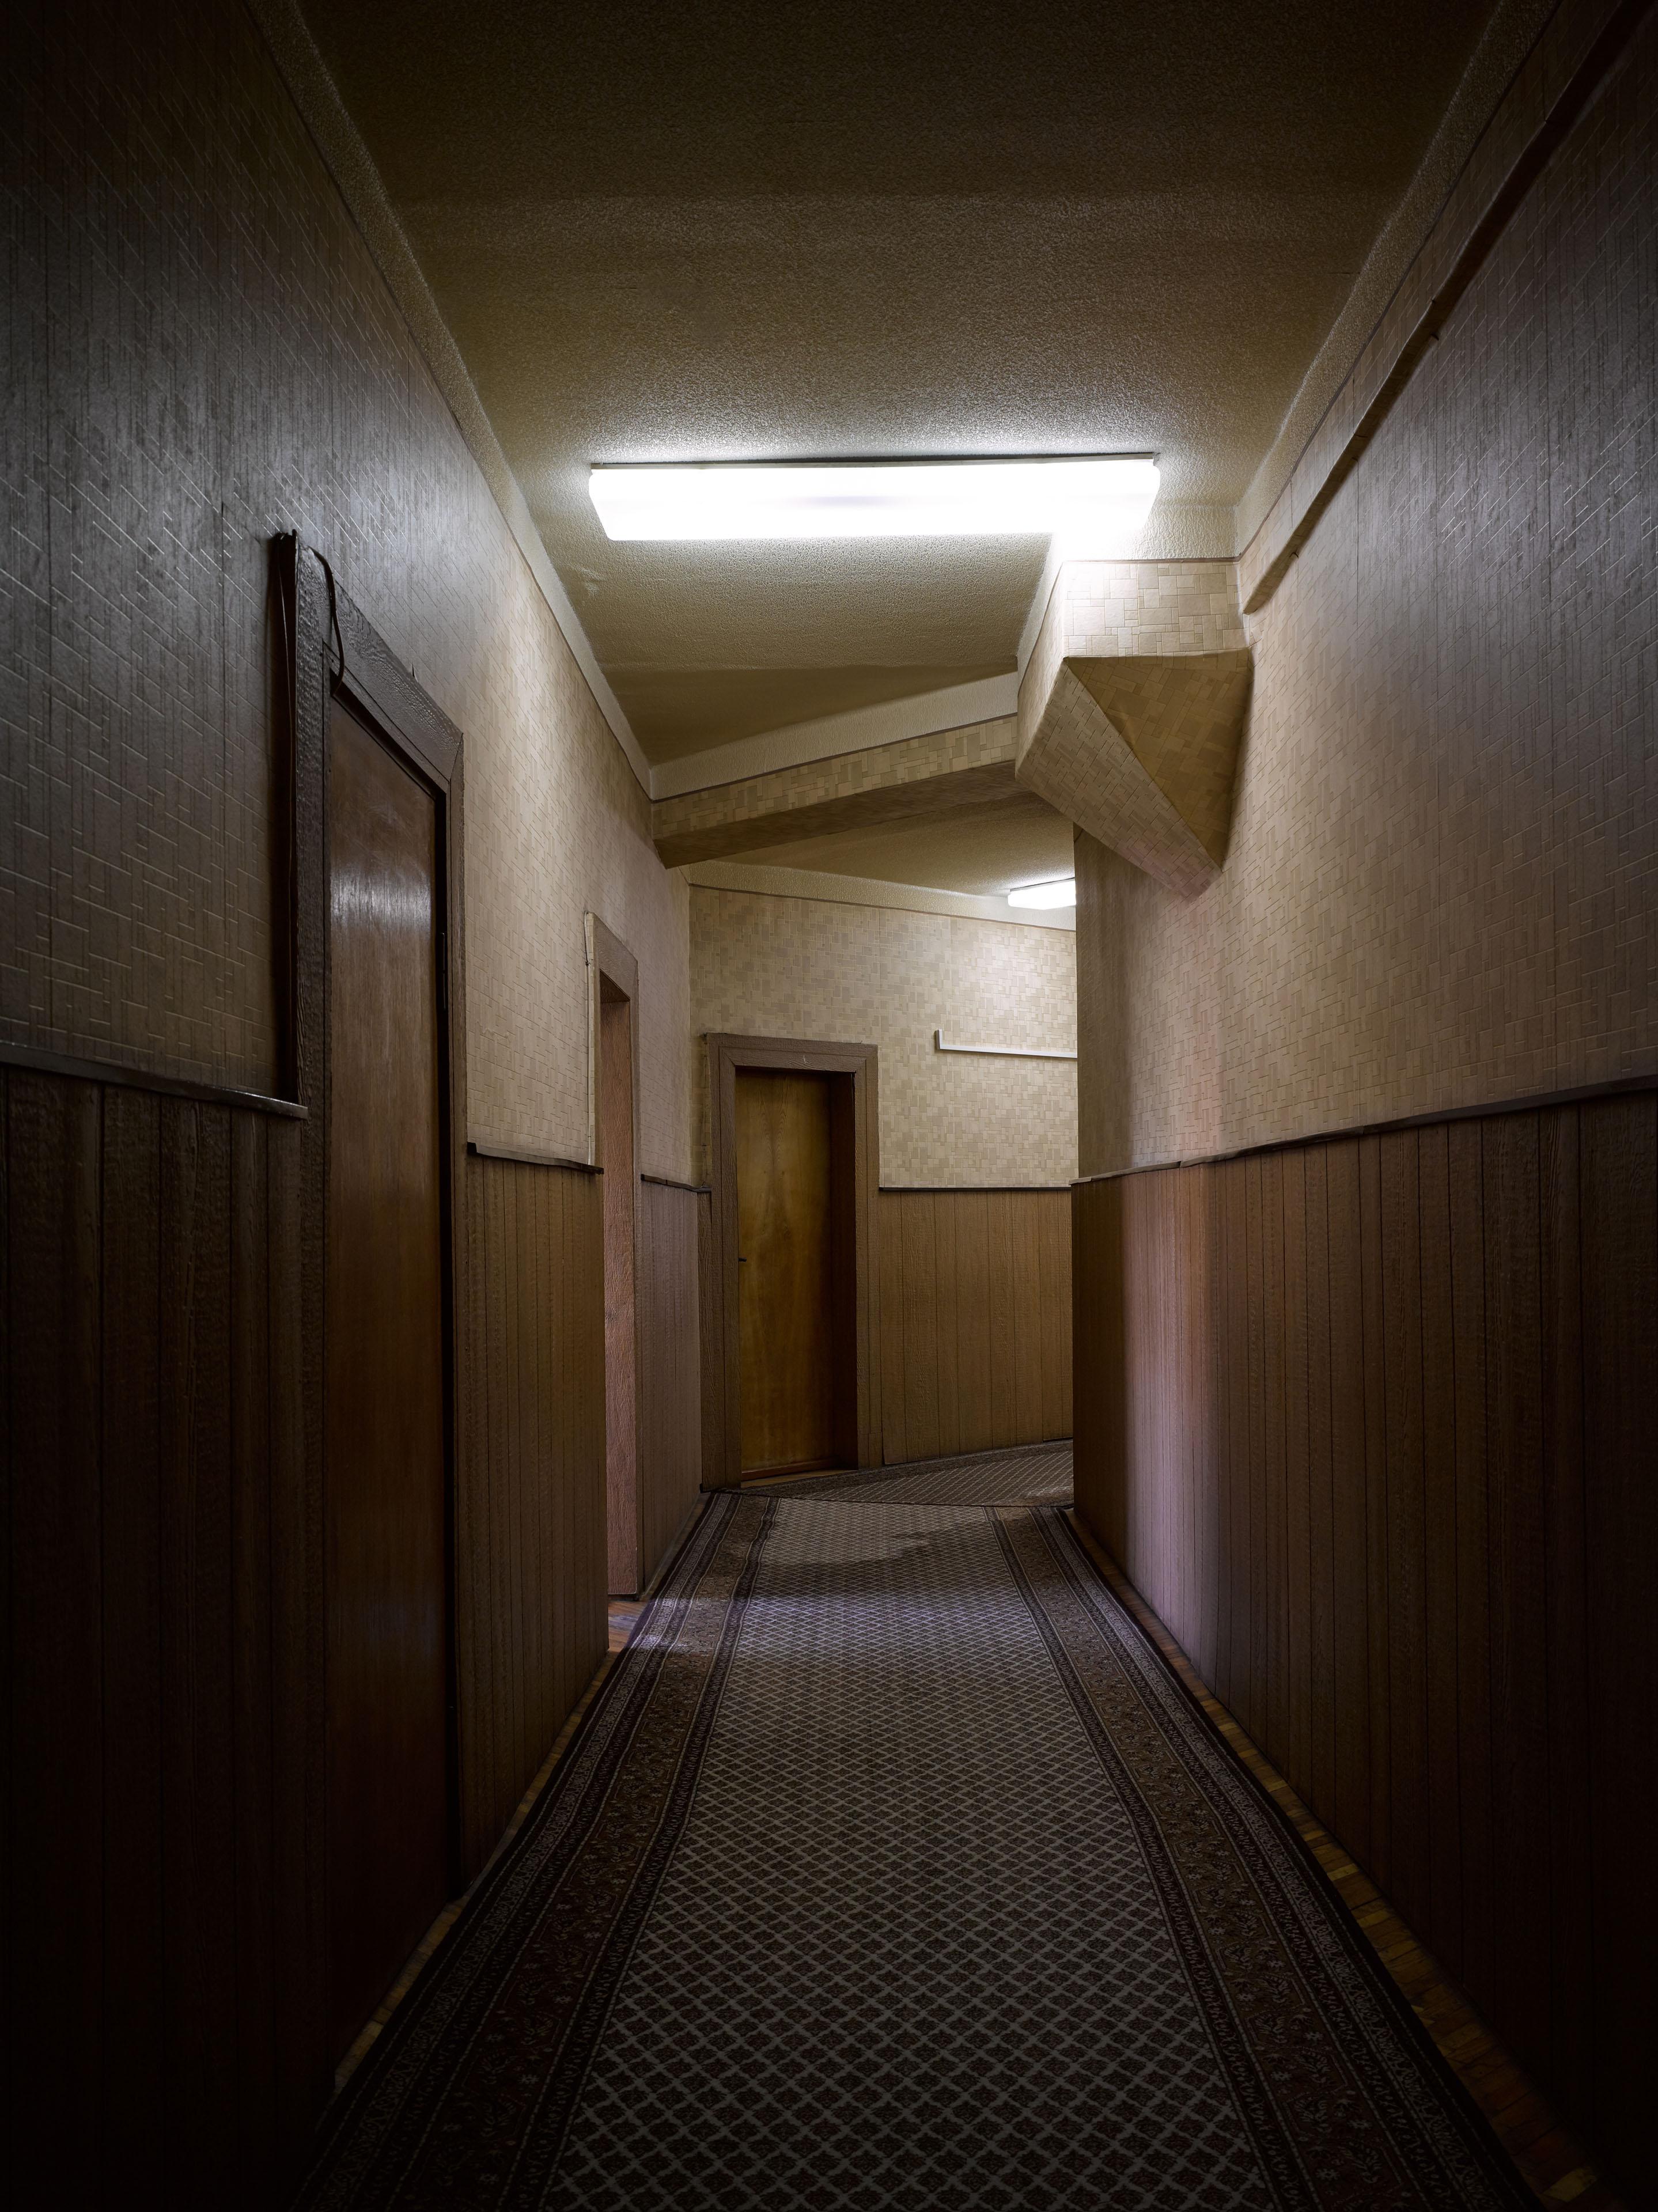 Rupp Stebler Hotel Cosmos